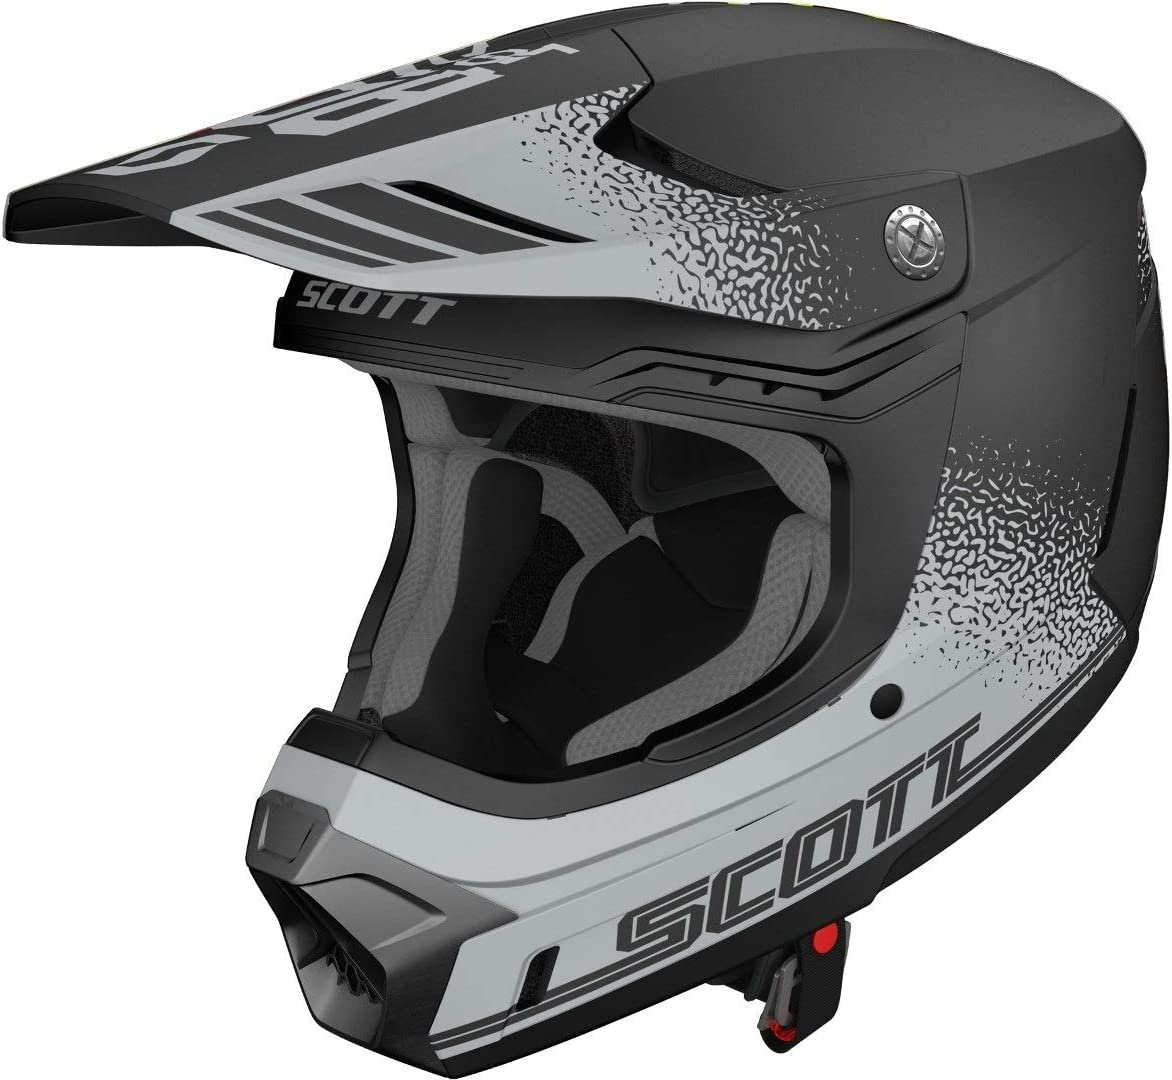 Scott 350 Evo Plus Retro Mx Enduro Motorrad Bike Helm Schwarz Grau 2020 Größe S 55 56cm Auto